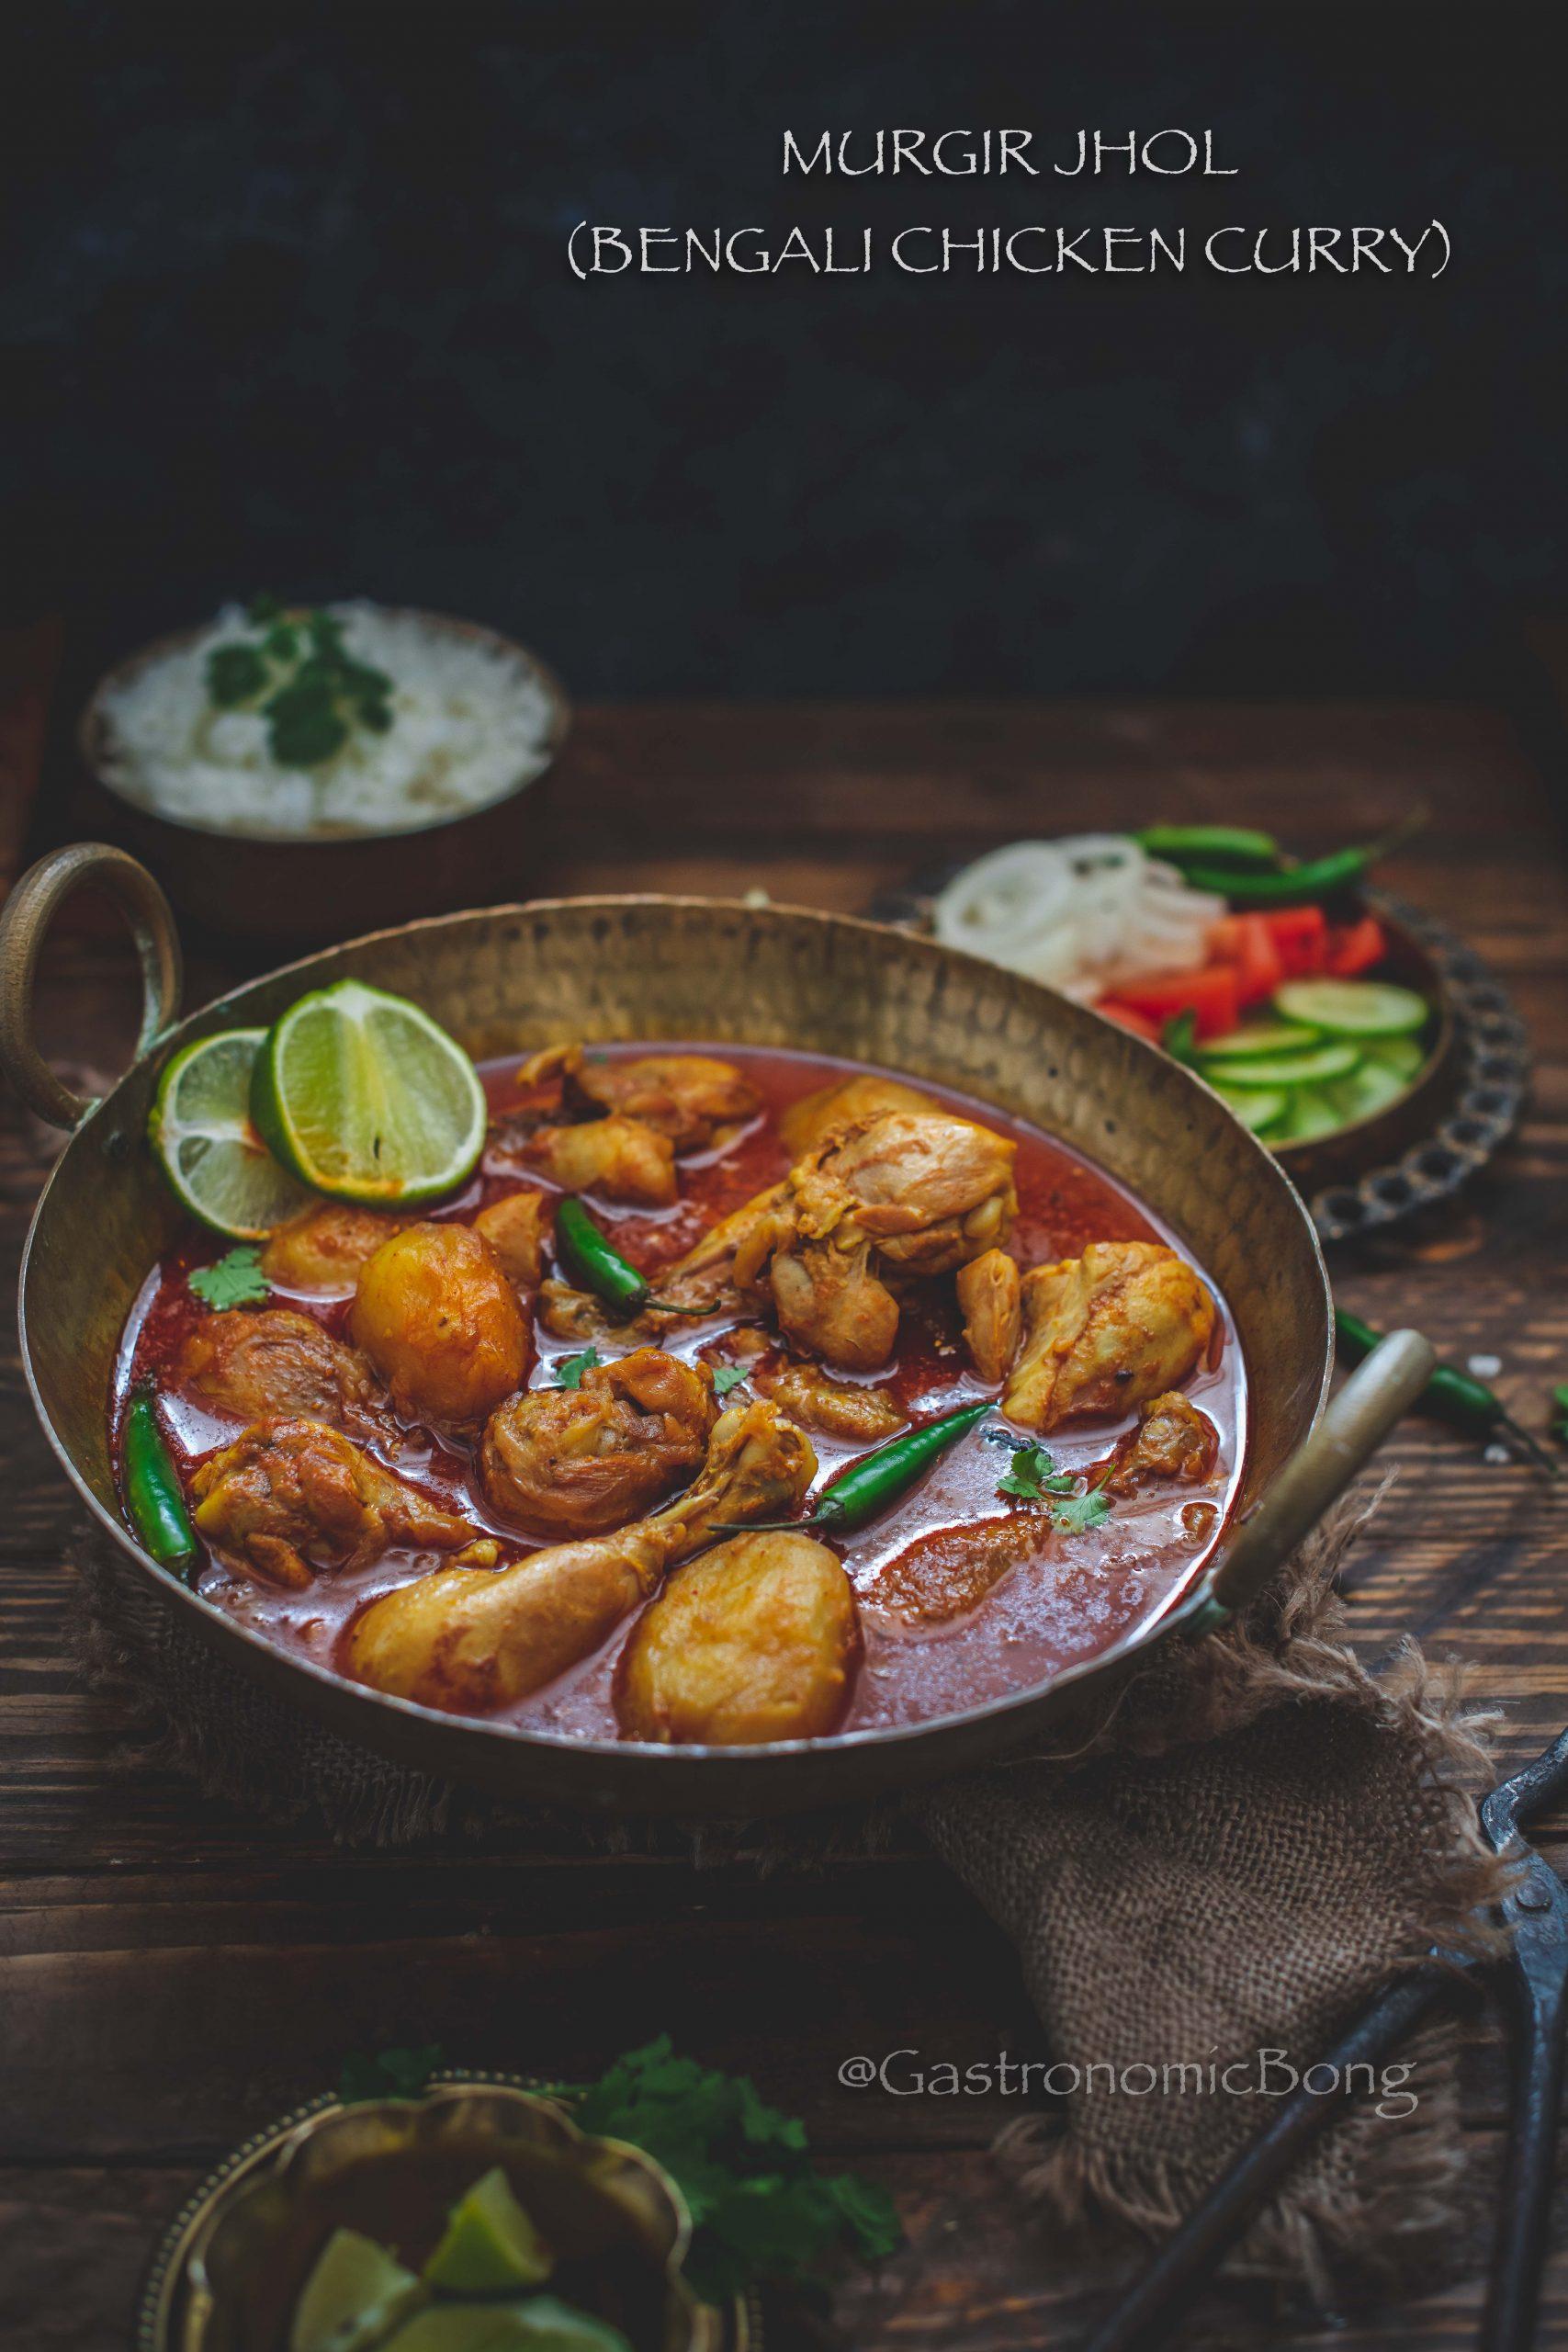 Murgir Jhol Bengali Chicken Curry Gastronomic Bong